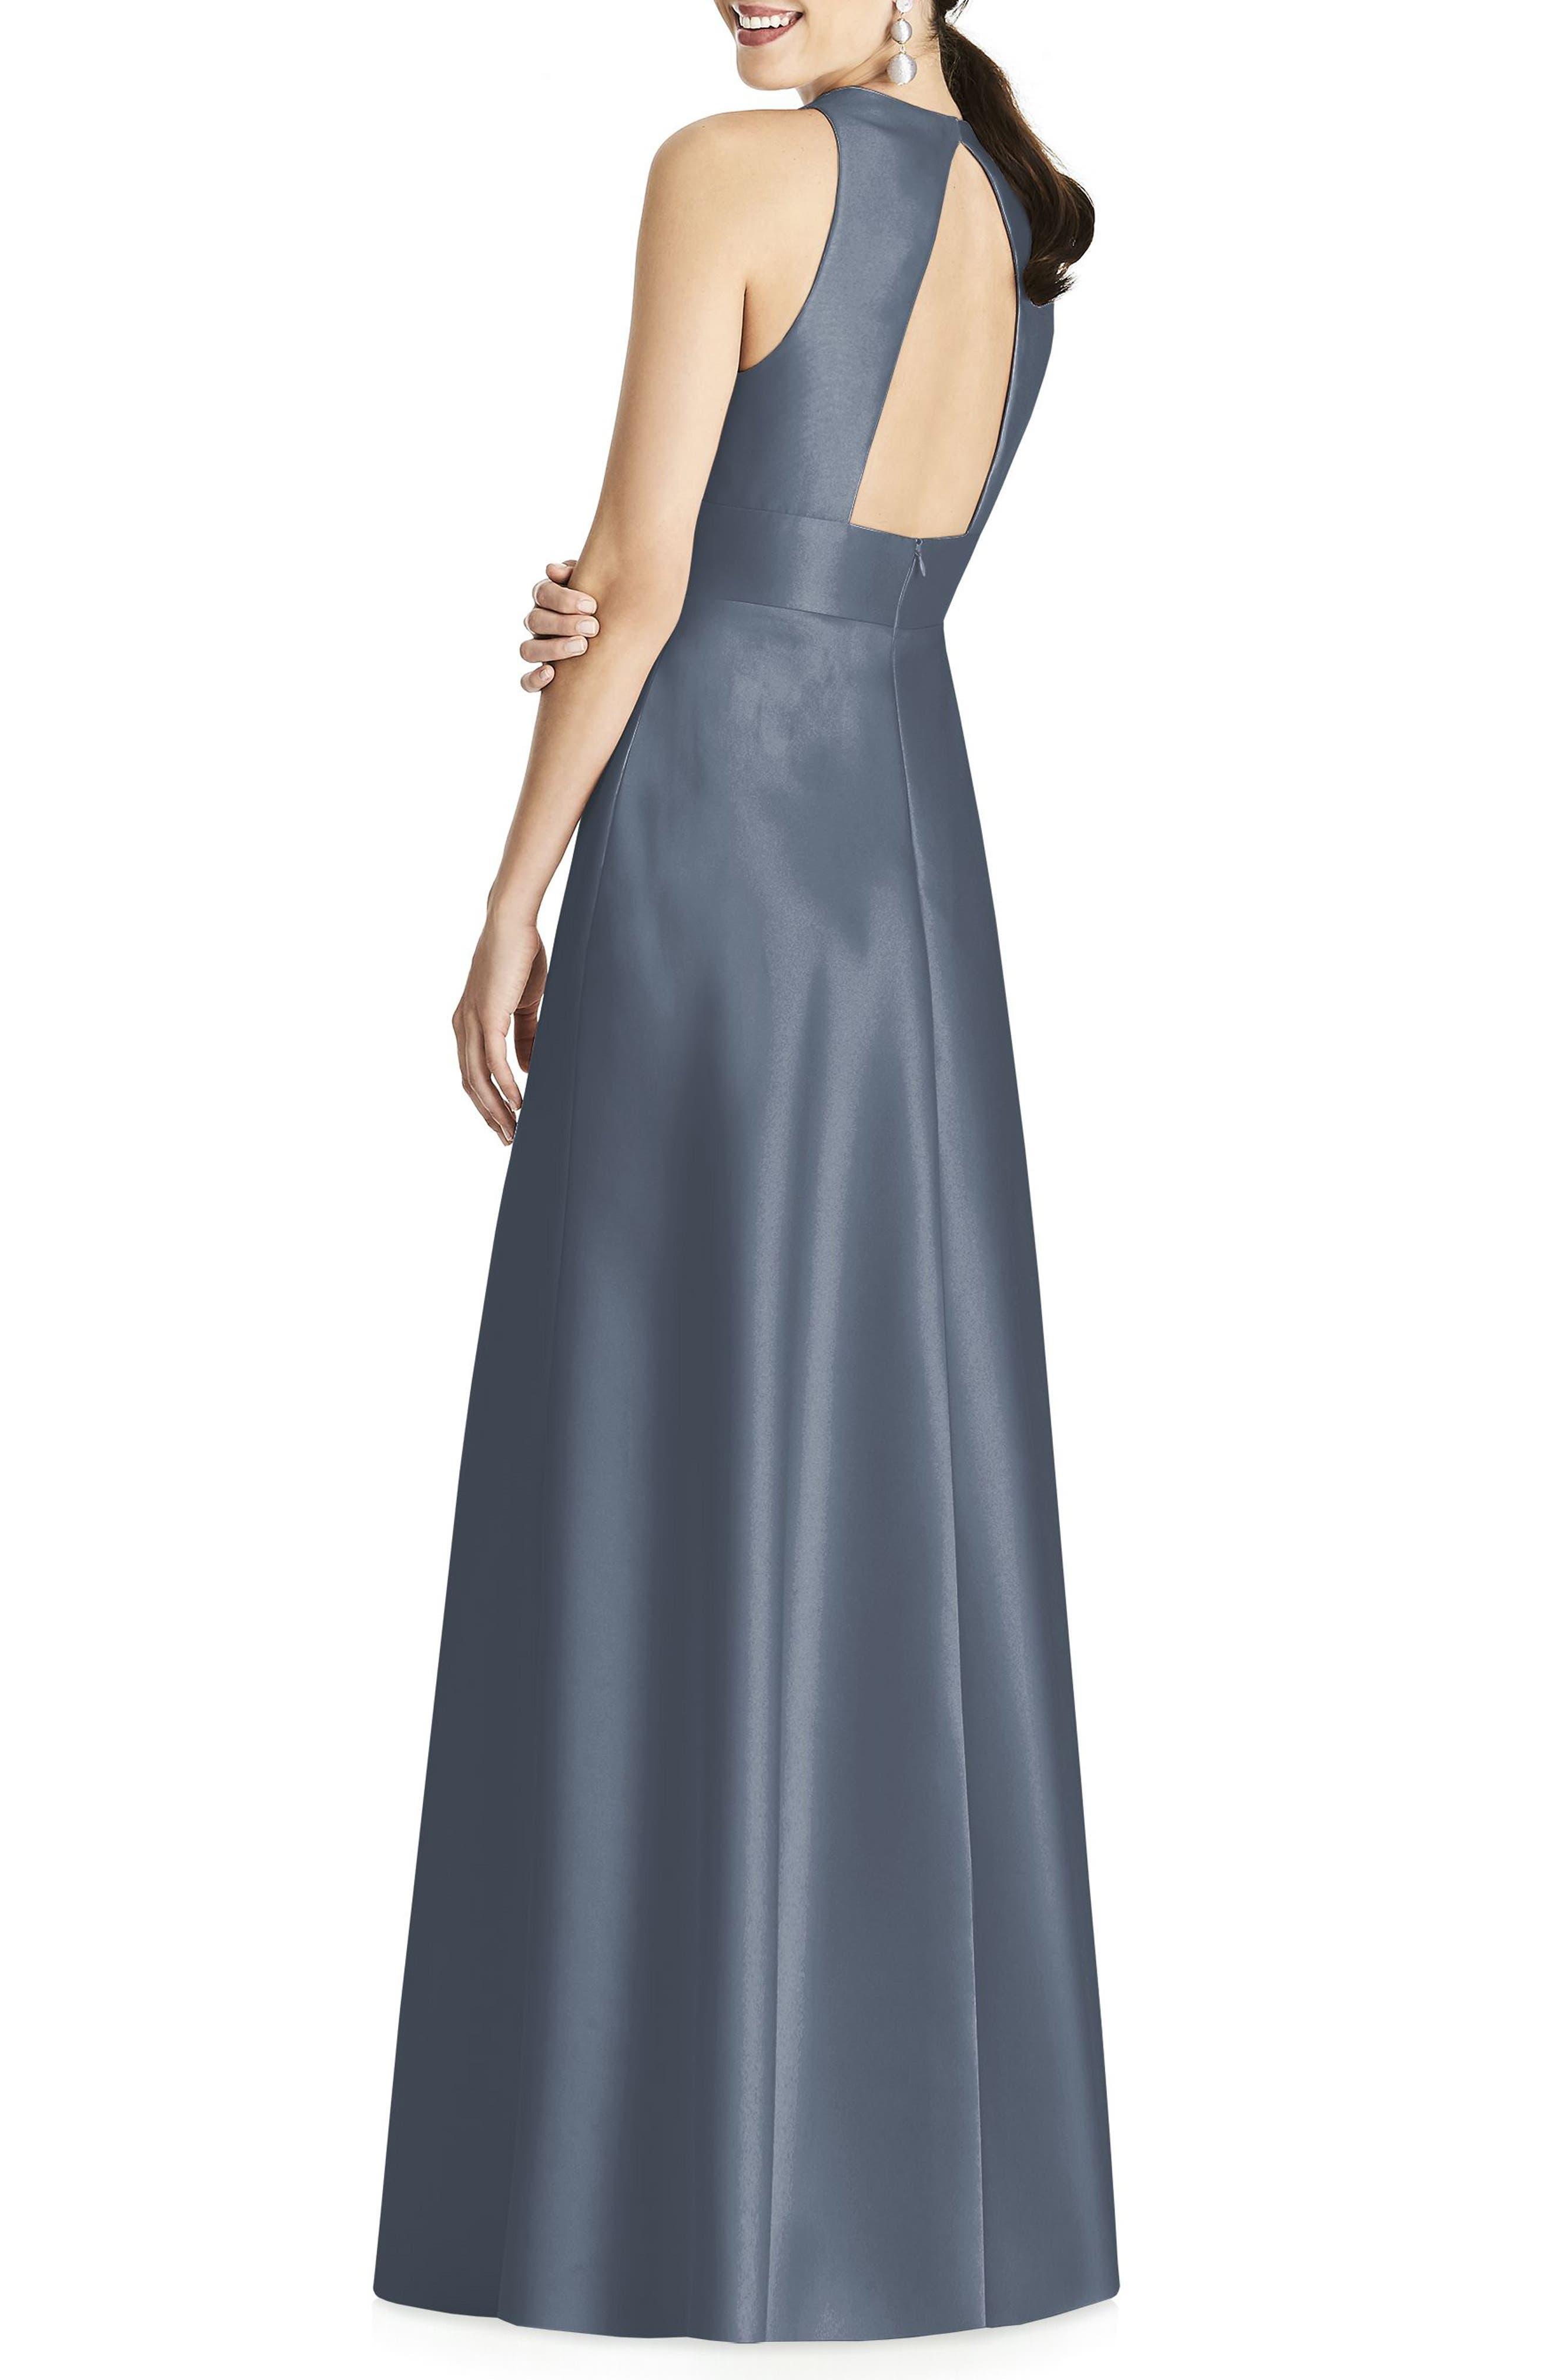 a82e3feae8890 Women's Empire Waist Dresses | Nordstrom